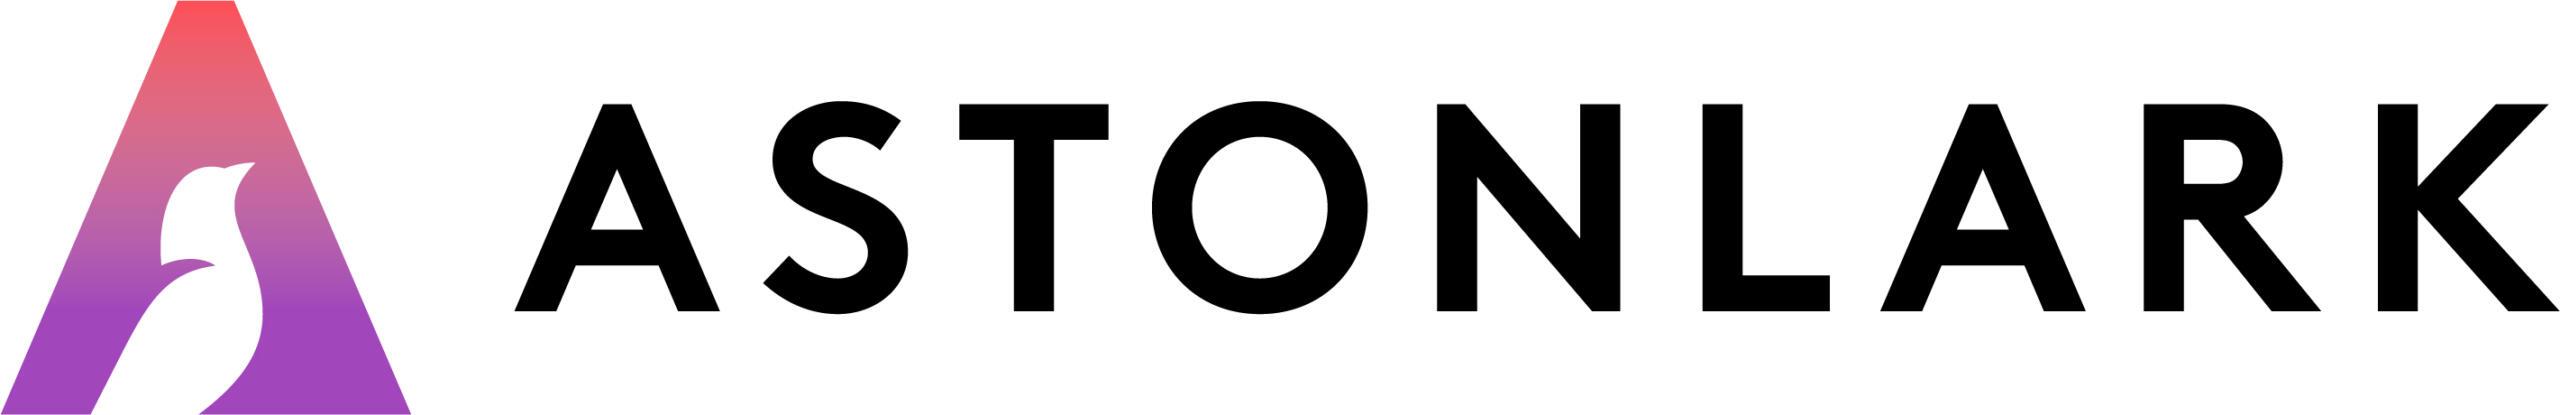 aston lark logo